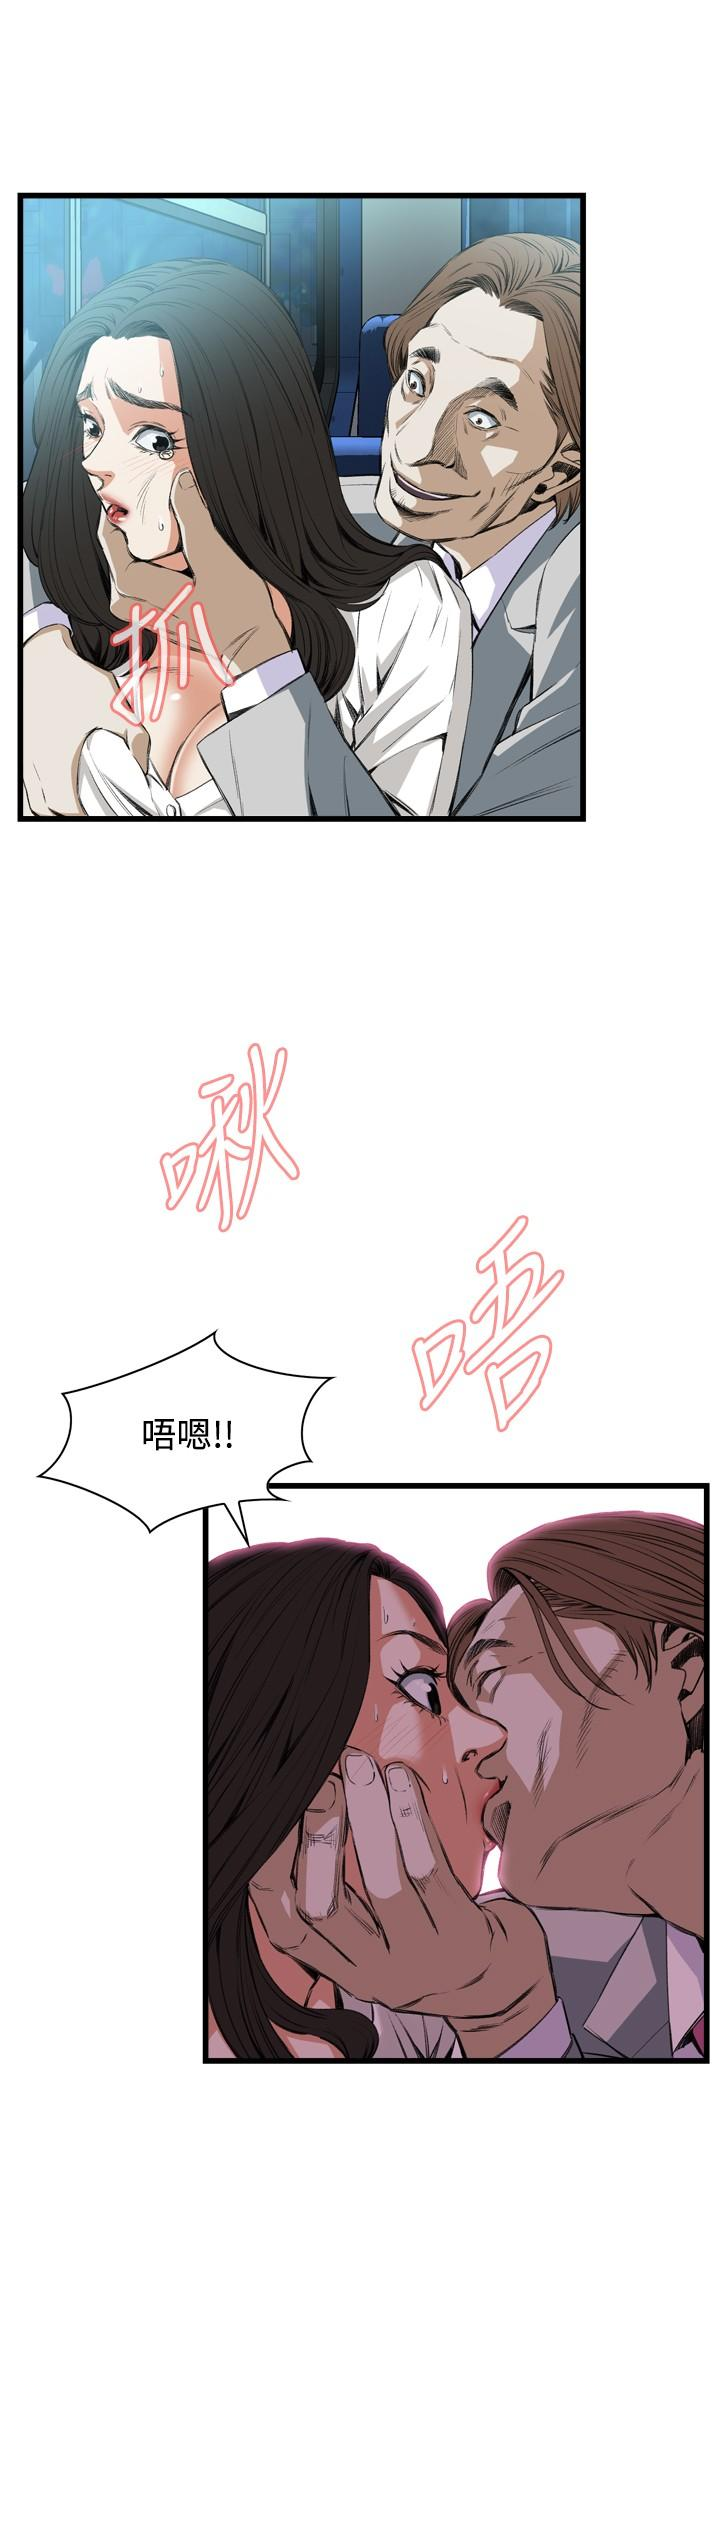 Take a Peek 偷窥 Ch.39~60 [Chinese]中文 327